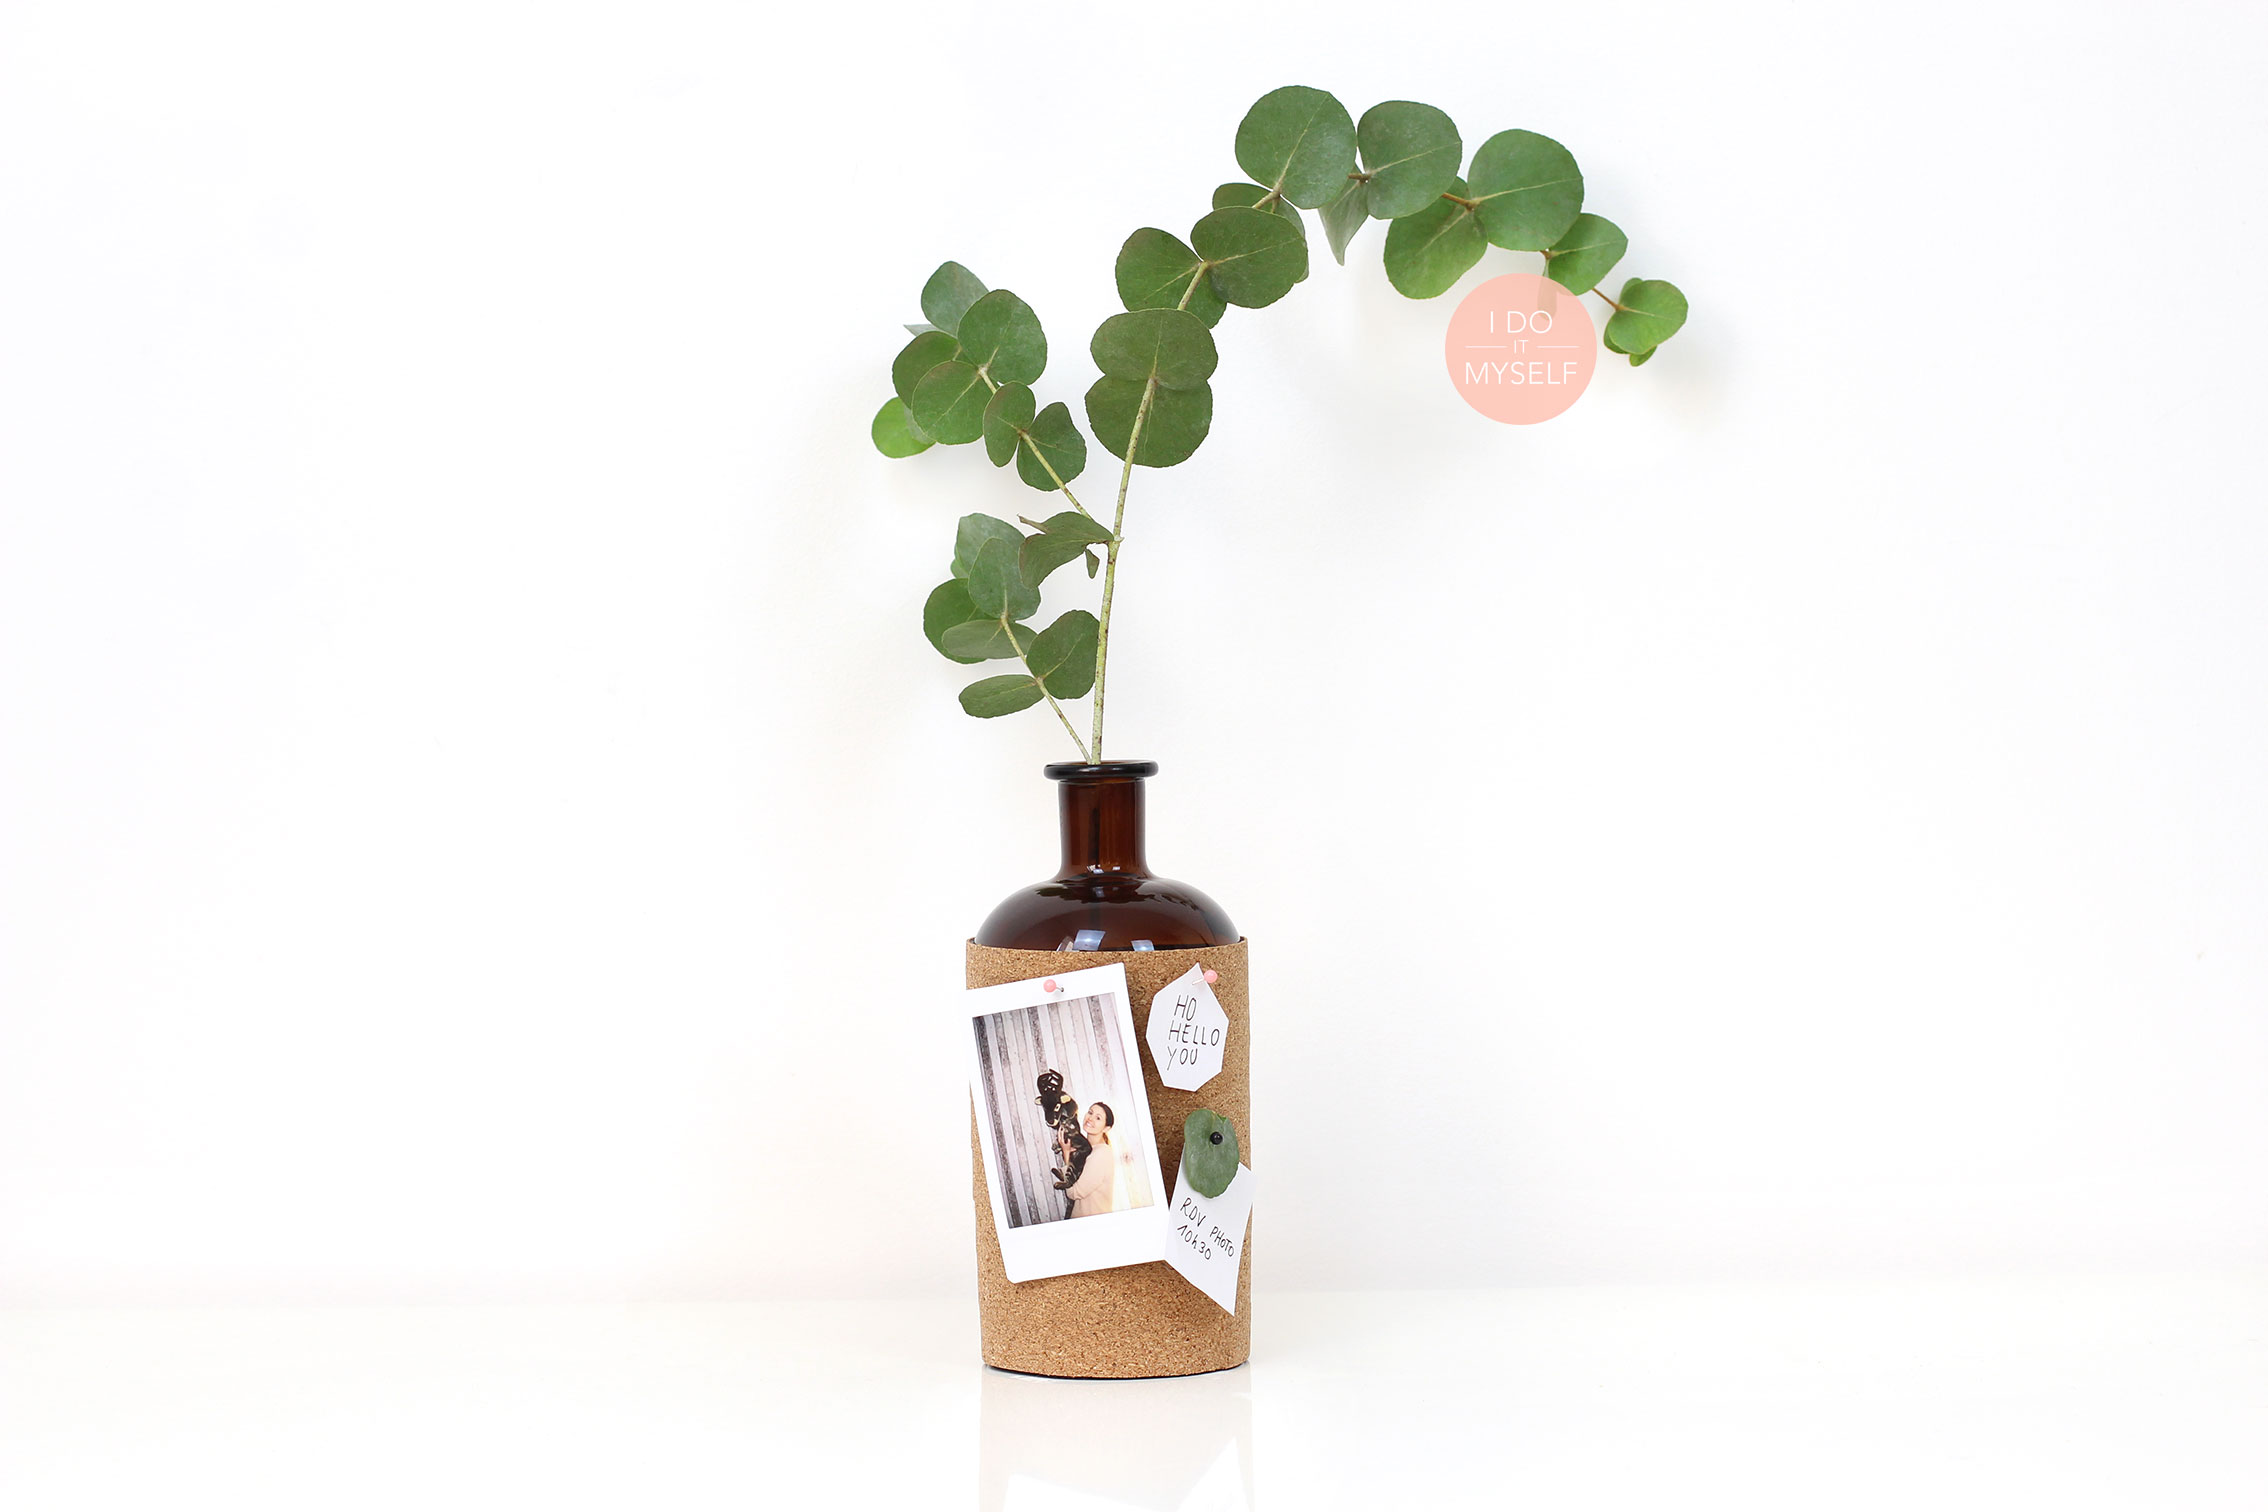 DIY cork bottle for a small desk